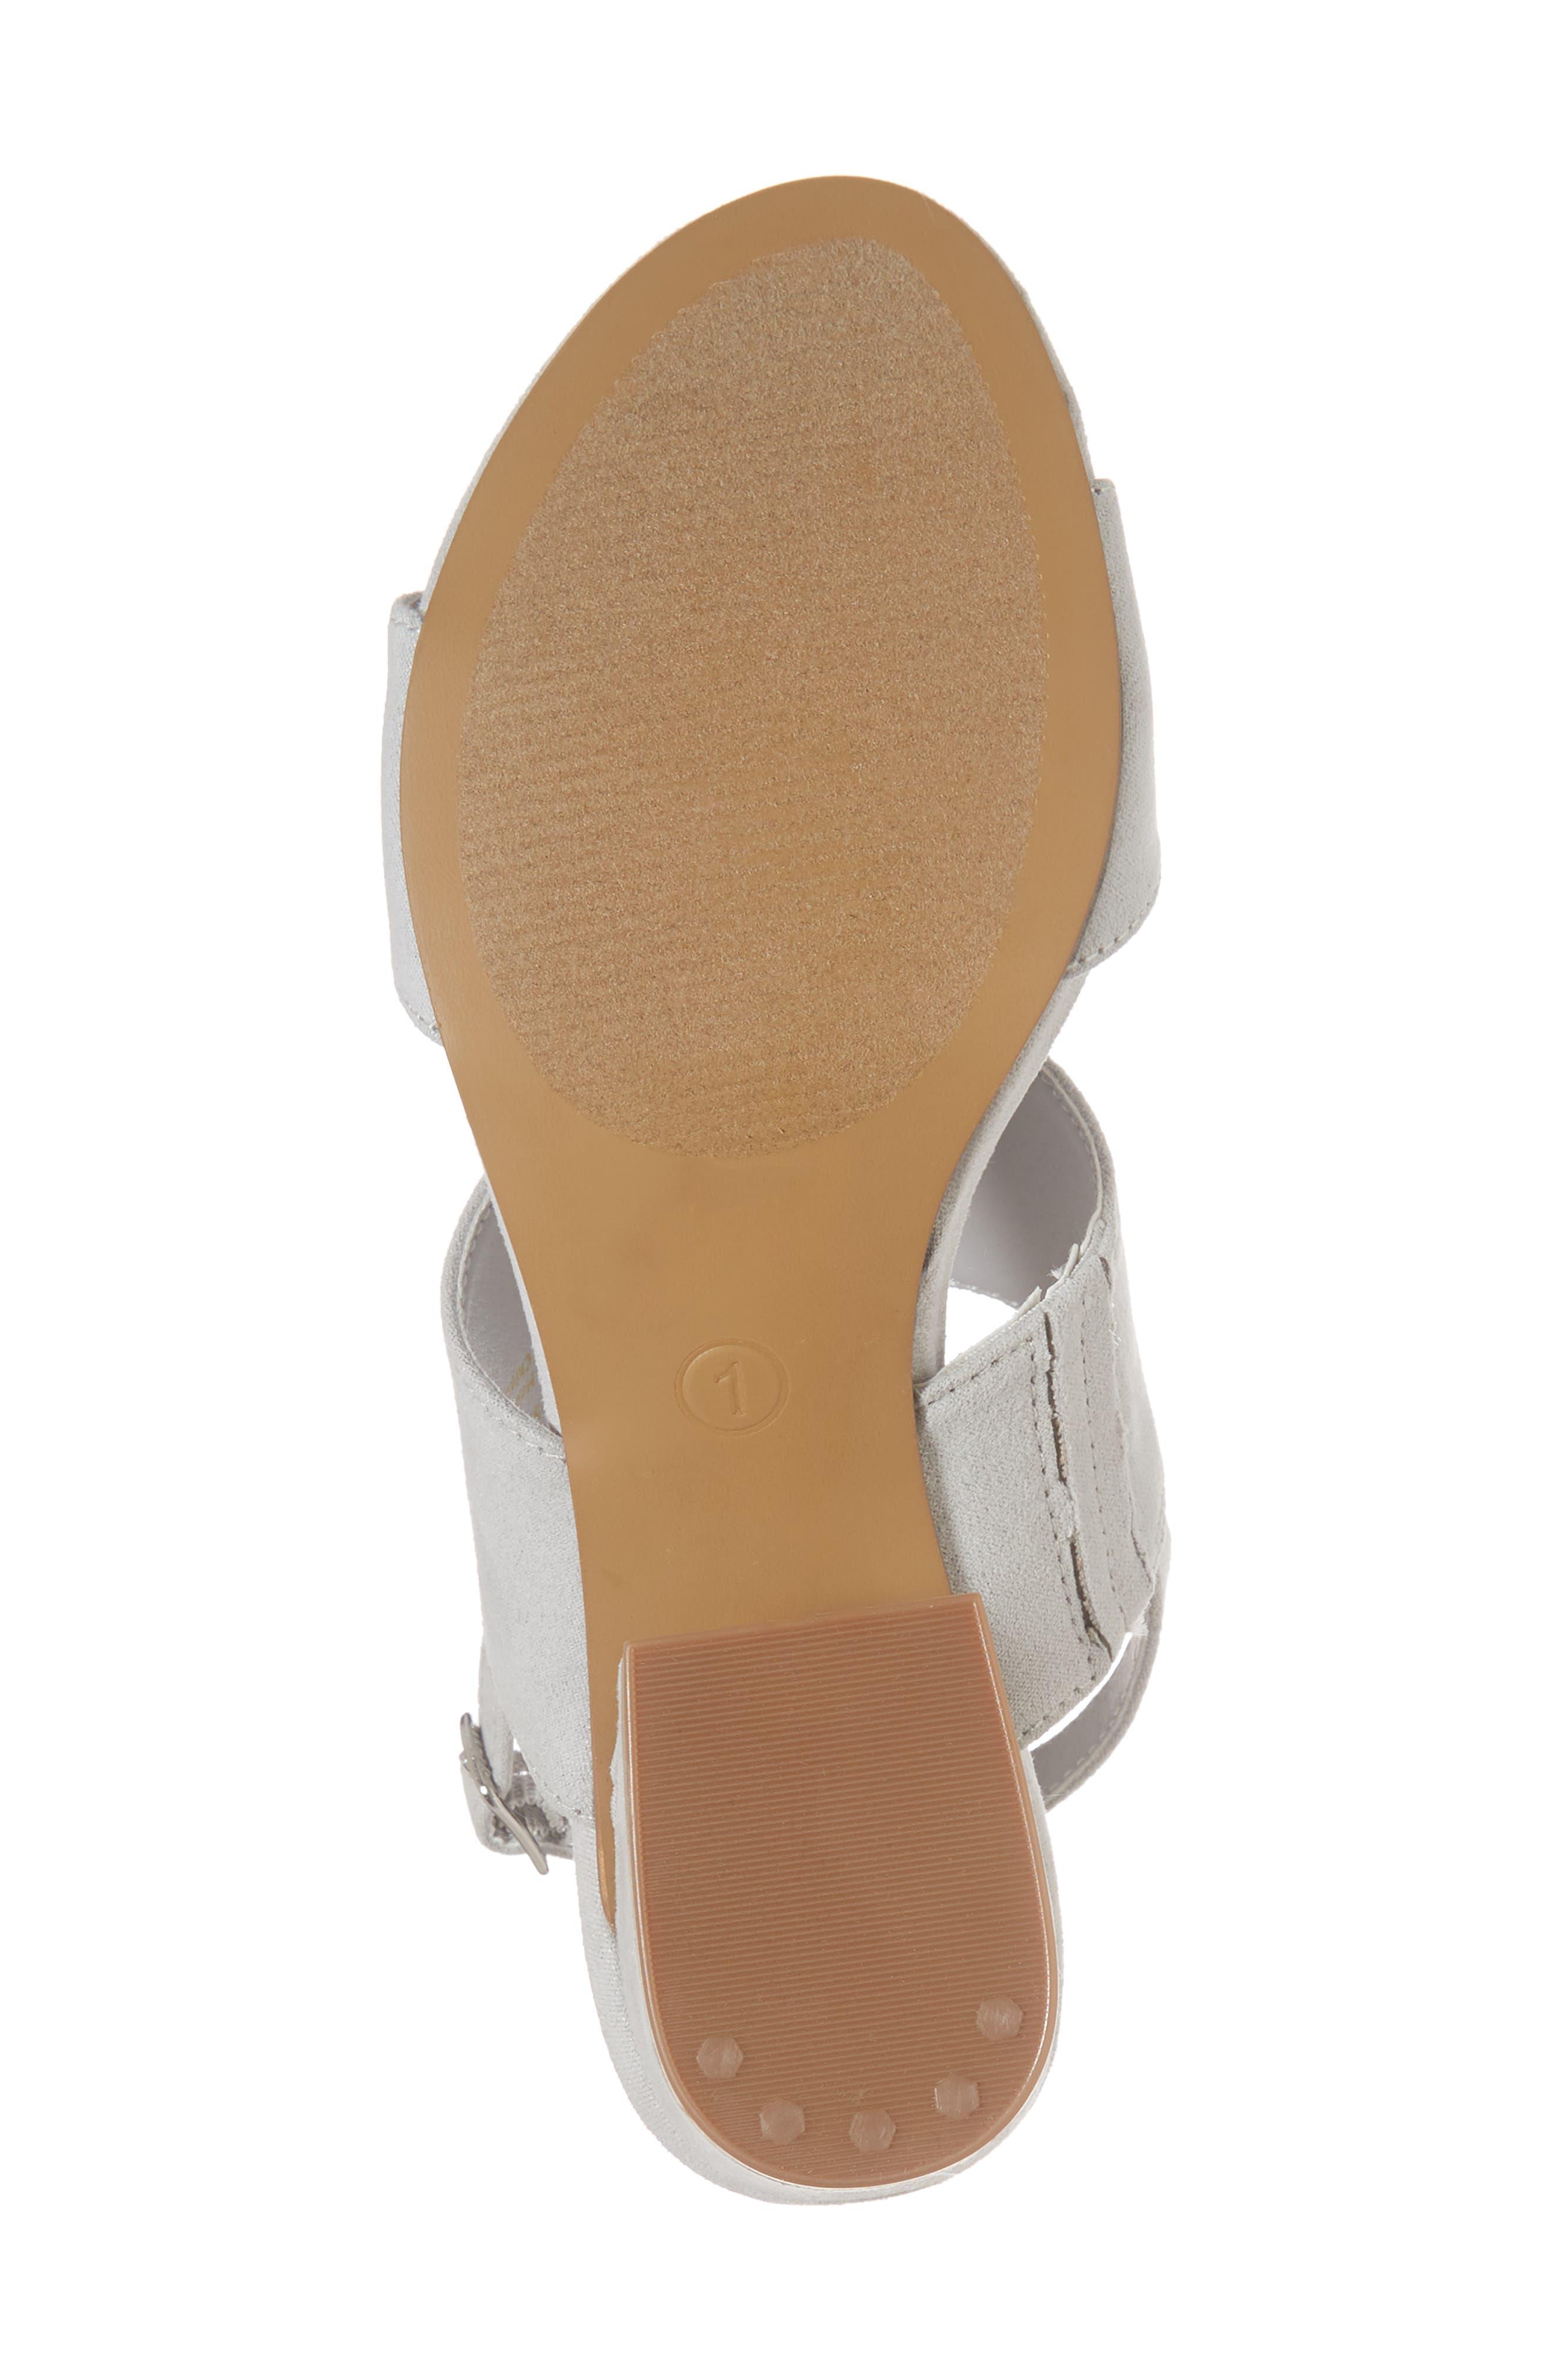 Lorne Flared Heel Sandal,                             Alternate thumbnail 6, color,                             025